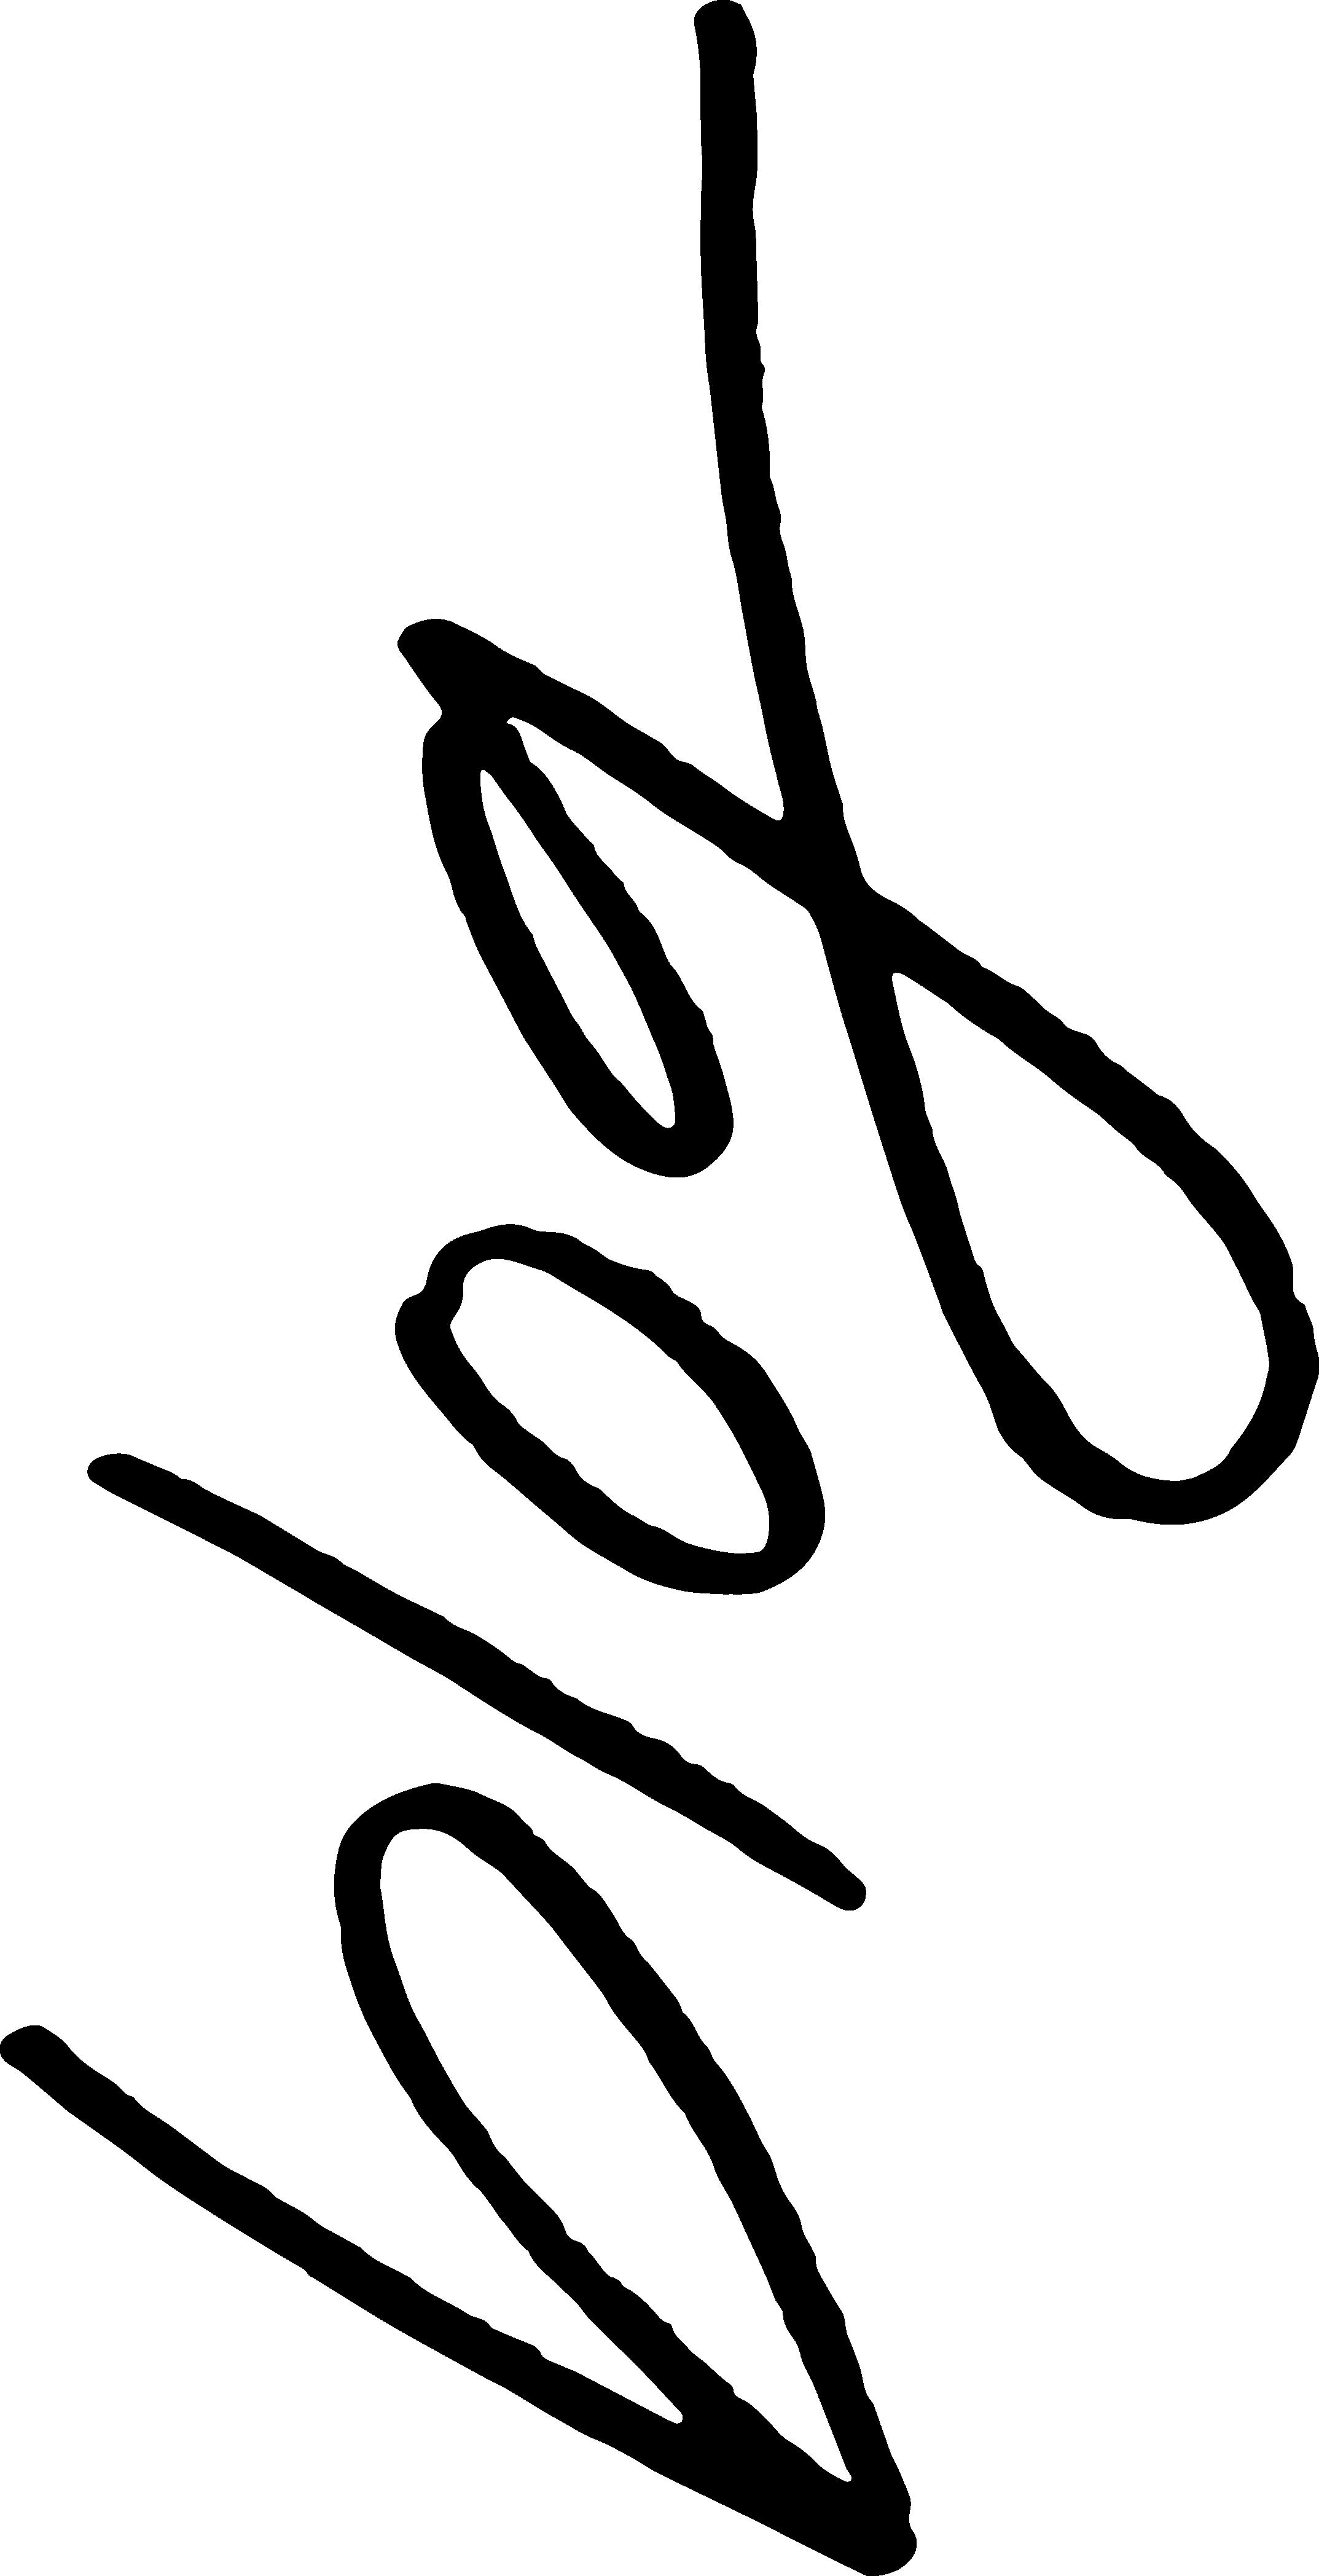 Image6[2].png